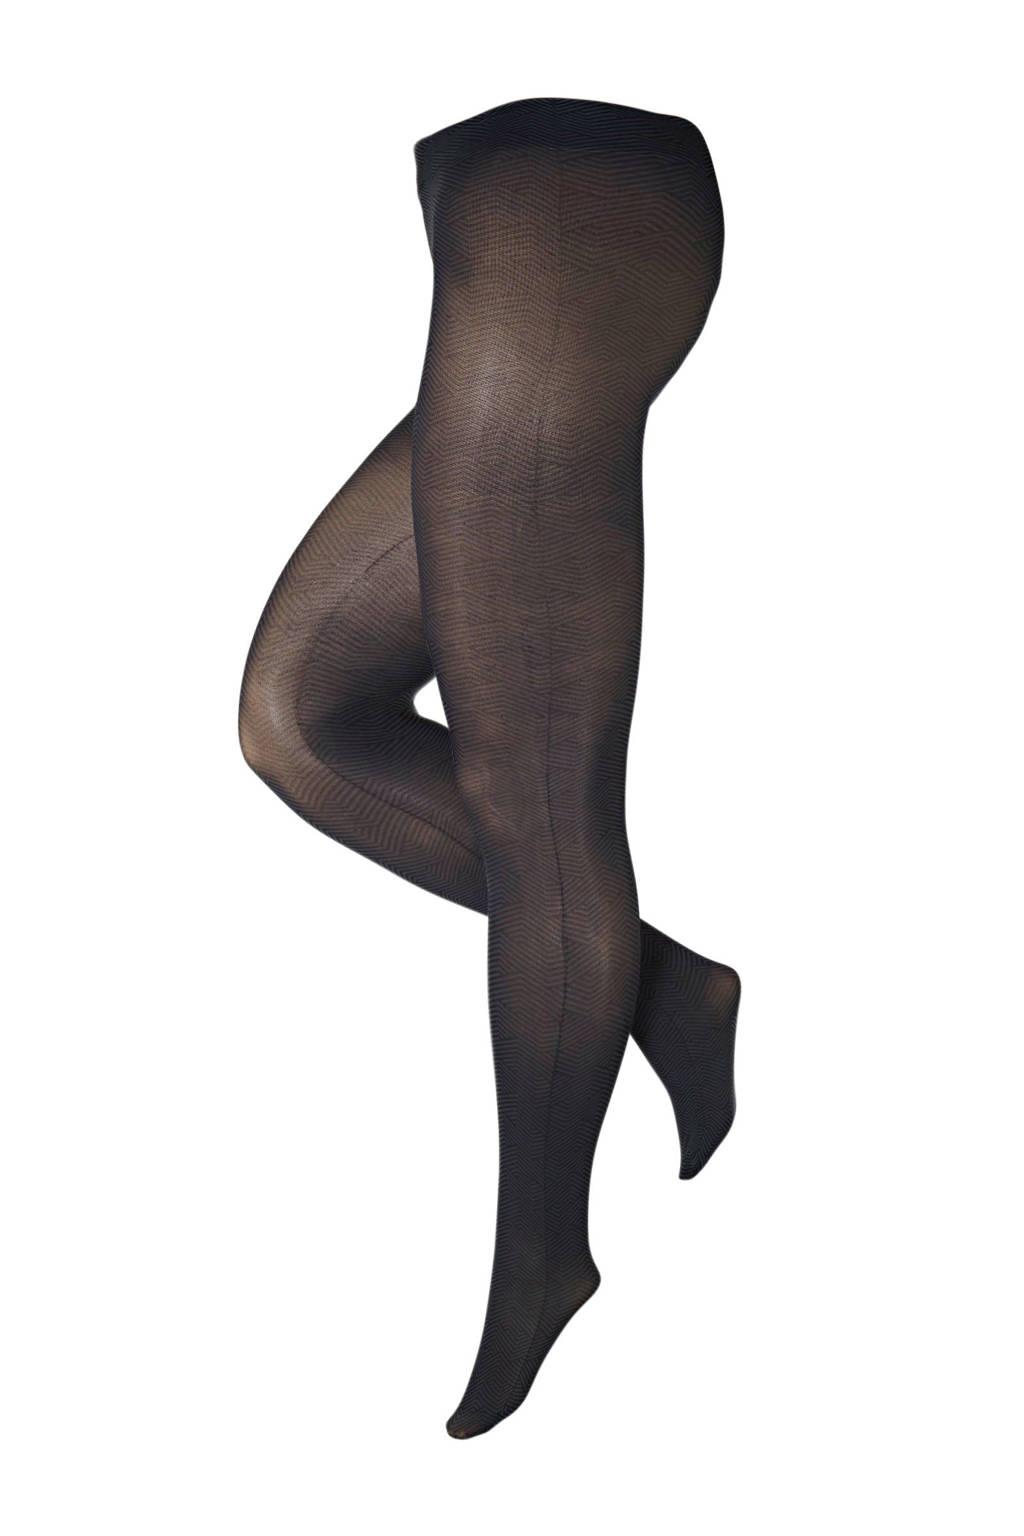 Pamela Mann super curvy + size panty Zigzag 50 denier zwart, Zwart